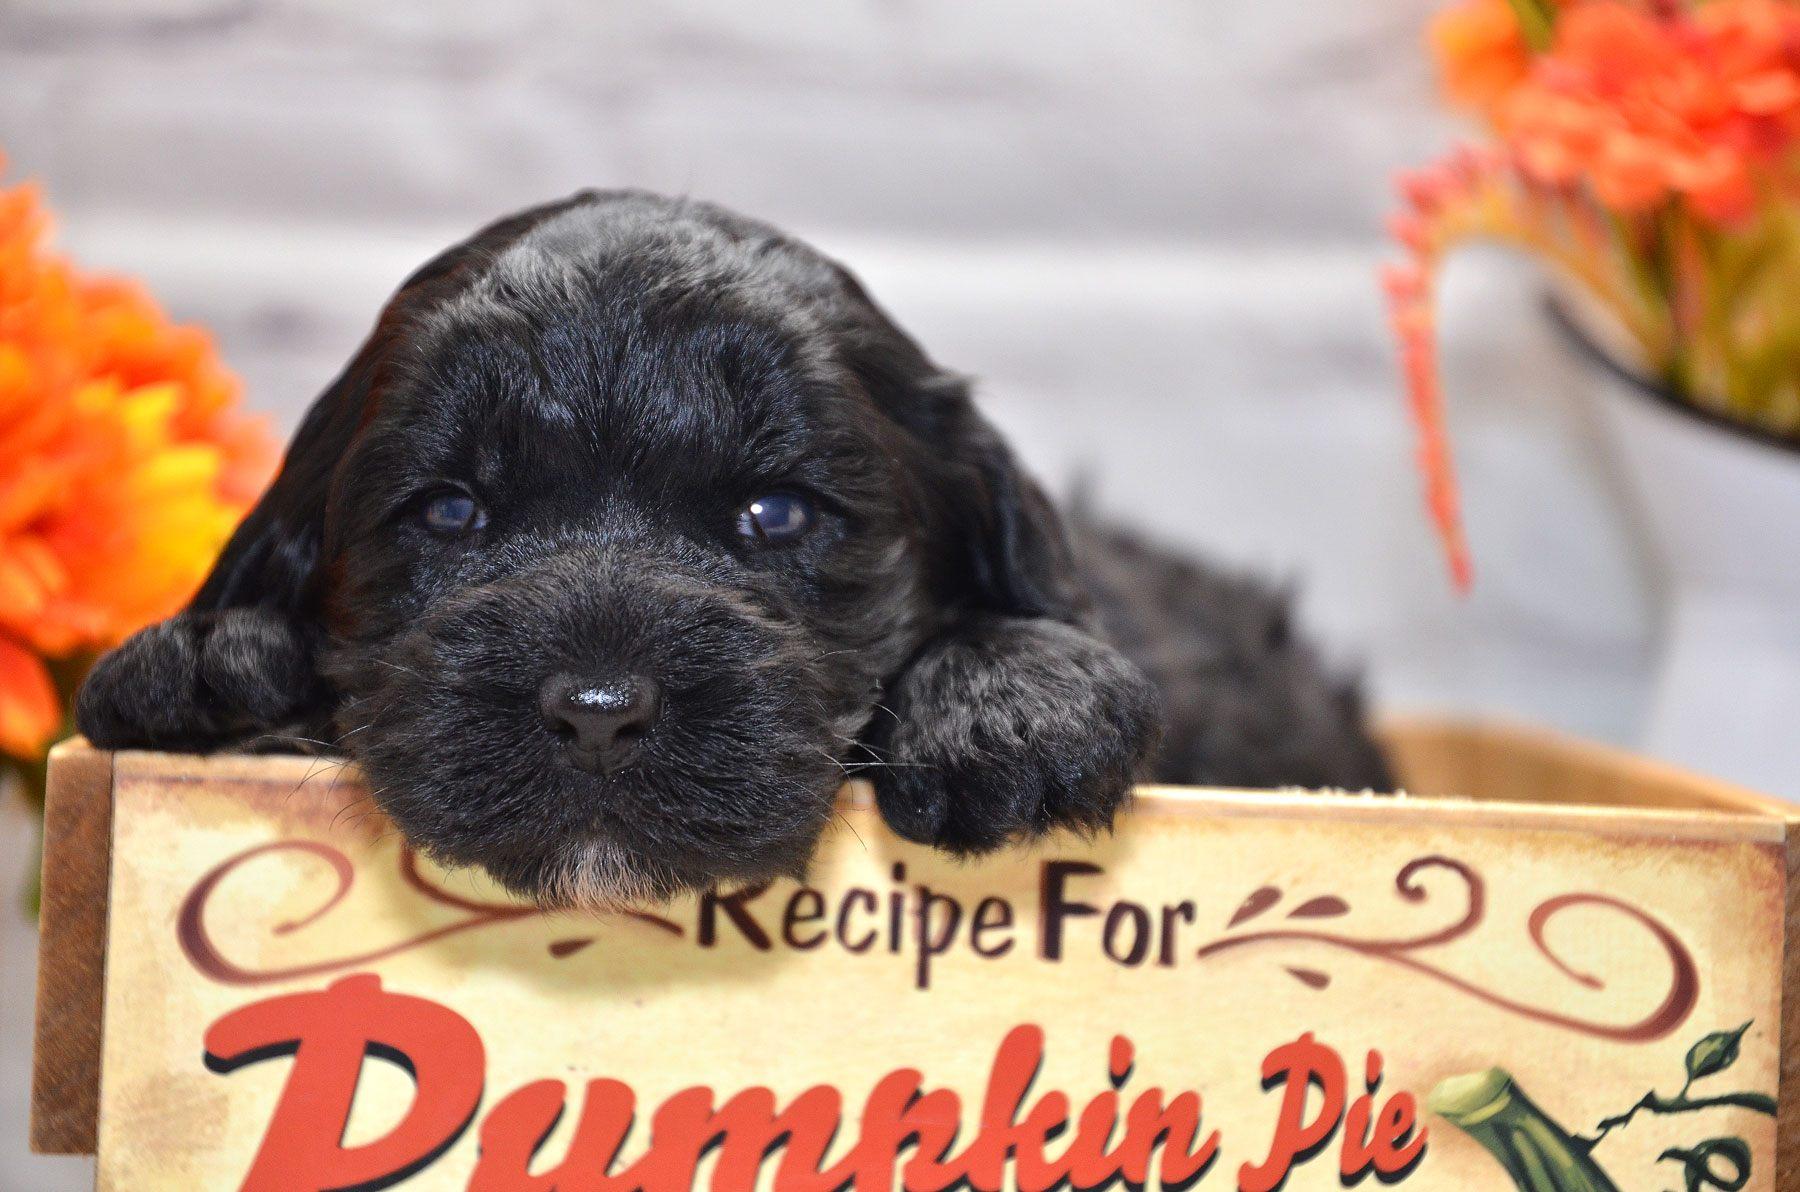 puppies-9-28-20_6638